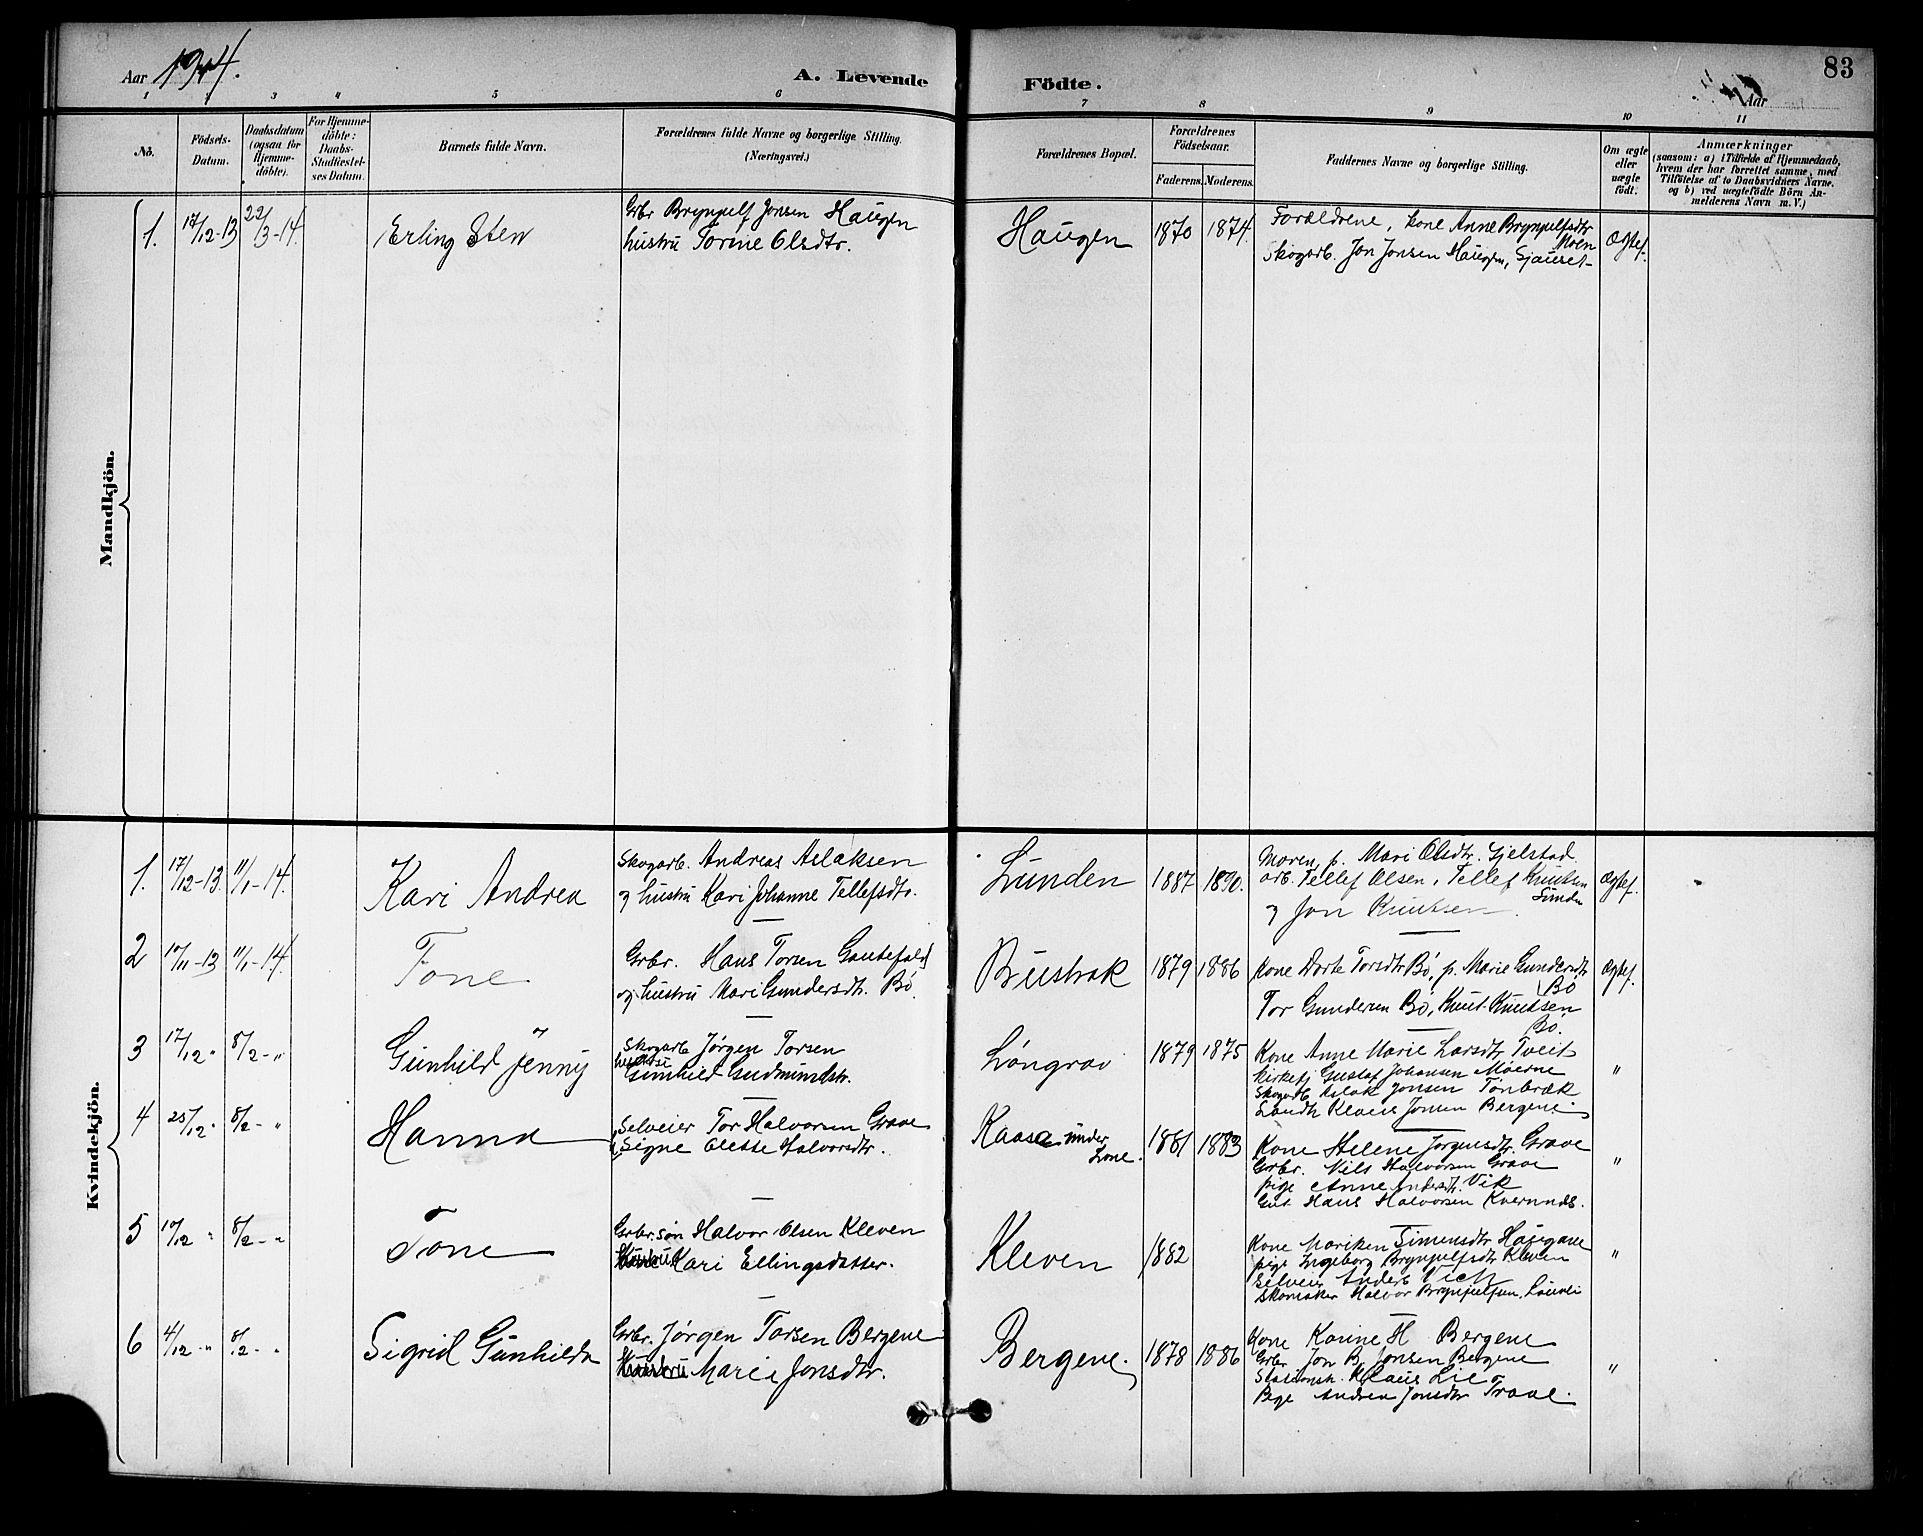 SAKO, Drangedal kirkebøker, G/Gb/L0002: Klokkerbok nr. II 2, 1895-1918, s. 83